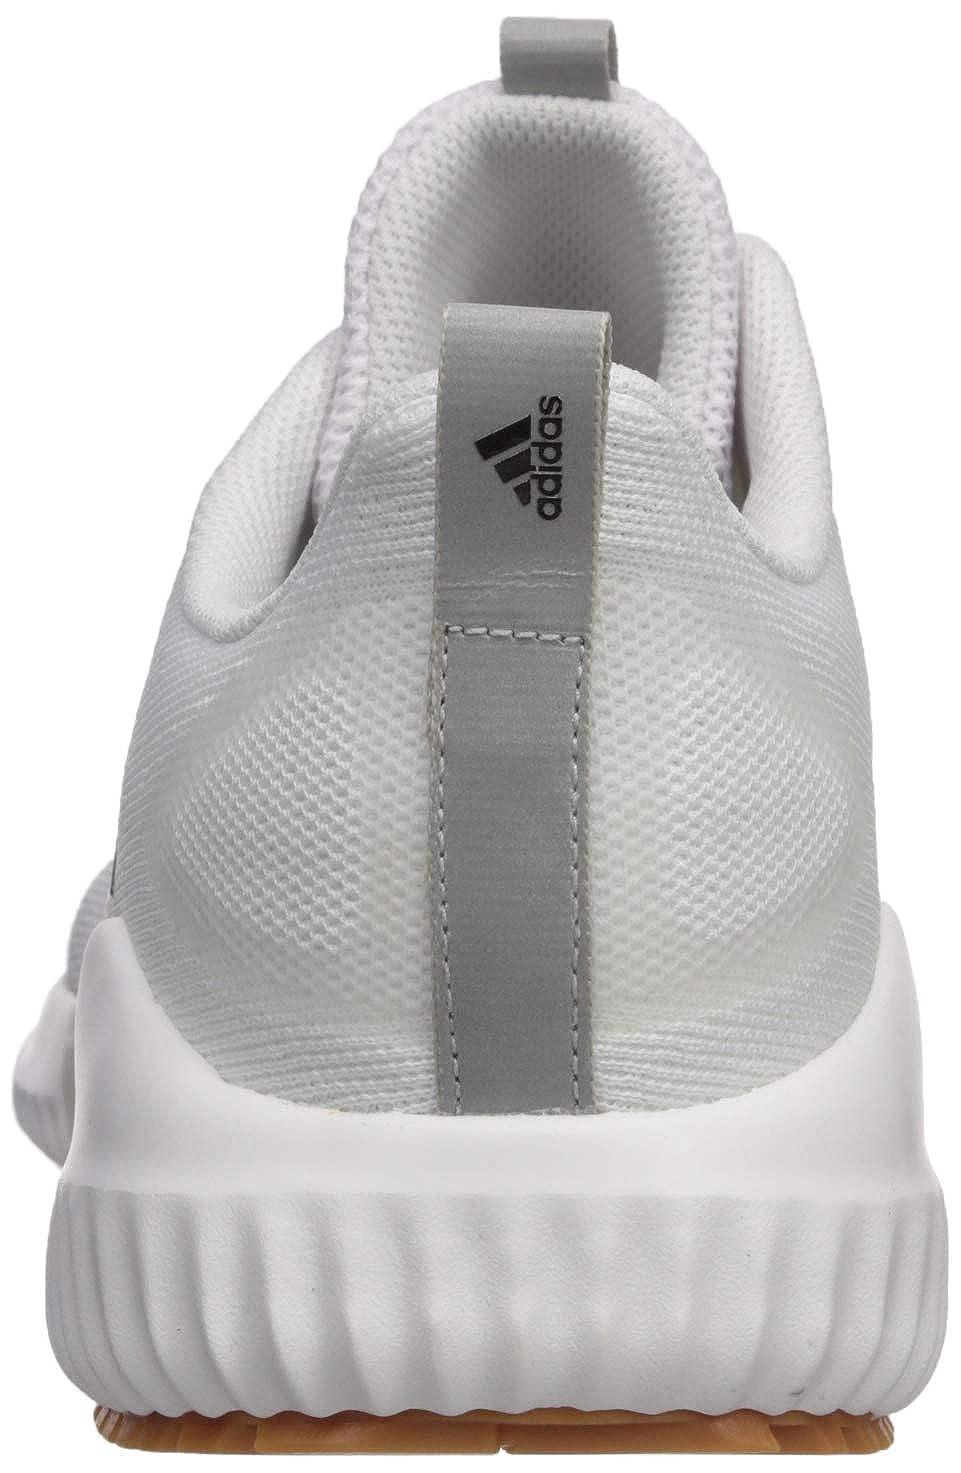 Adidas Edge Runner - Zapatillas de Running para Hombre: Amazon.es ...